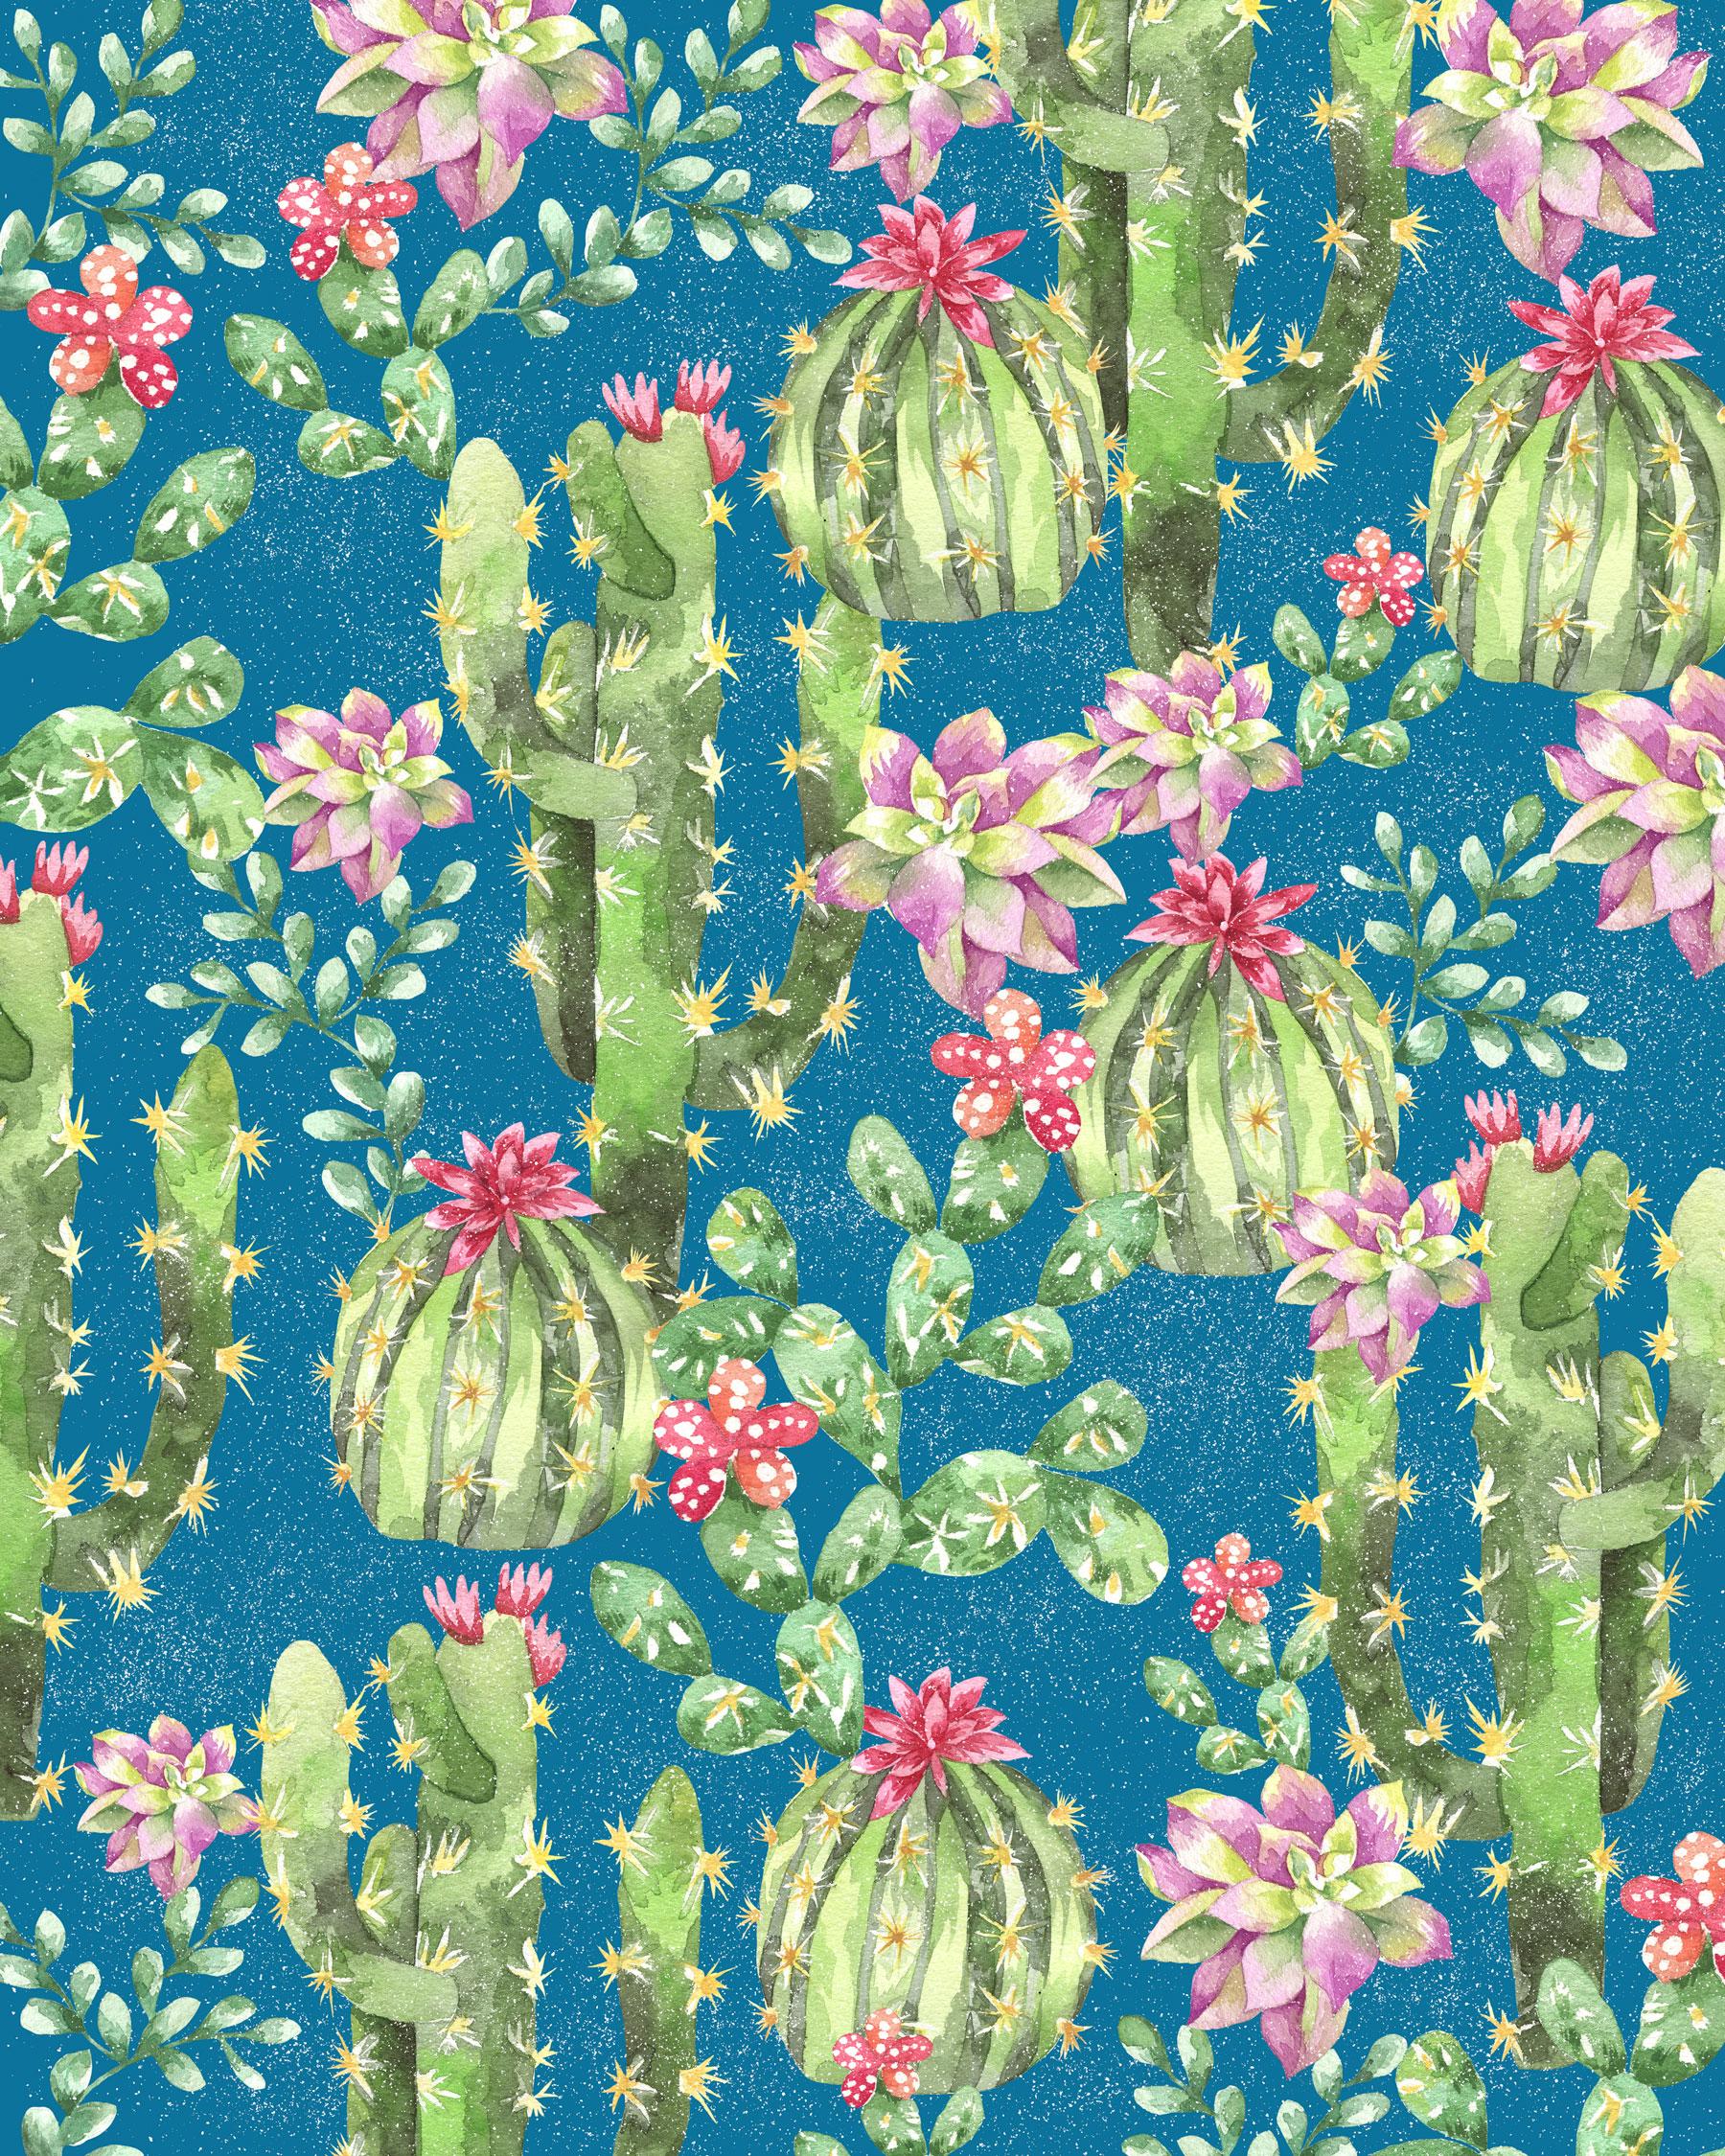 Winter-Cactus-Allover.jpg